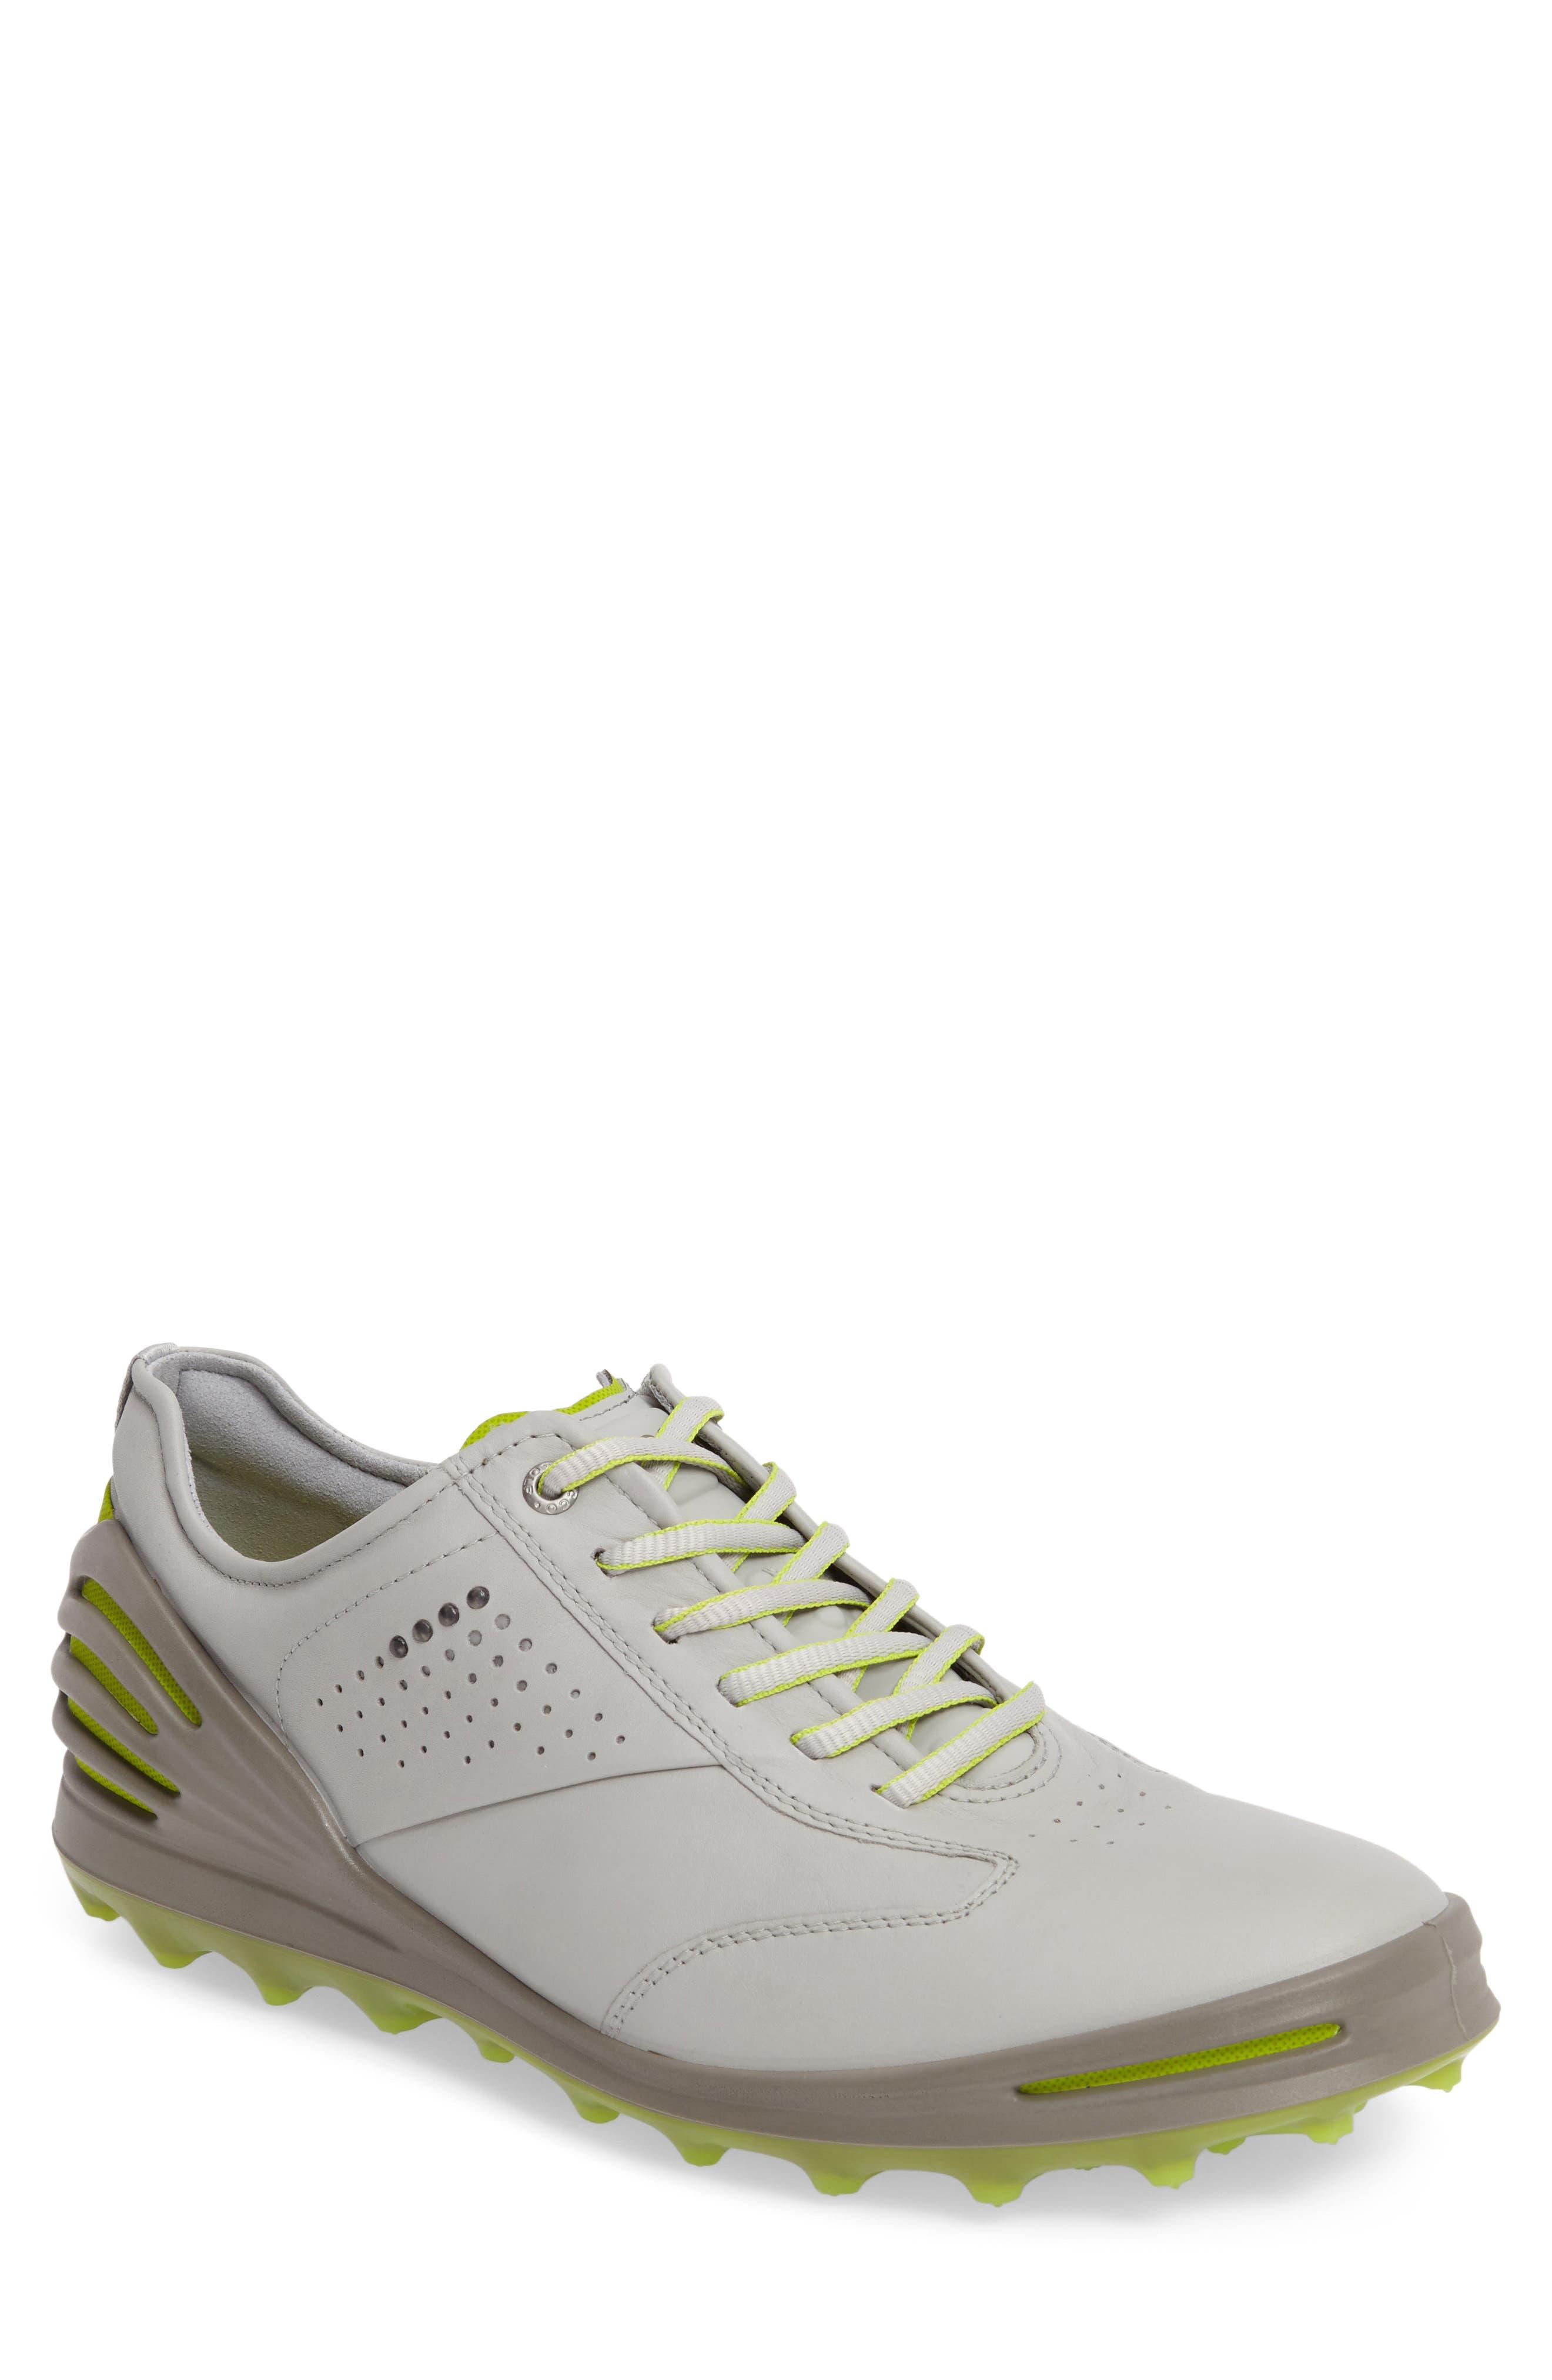 Alternate Image 1 Selected - ECCO Cage Pro Golf Shoe (Men)